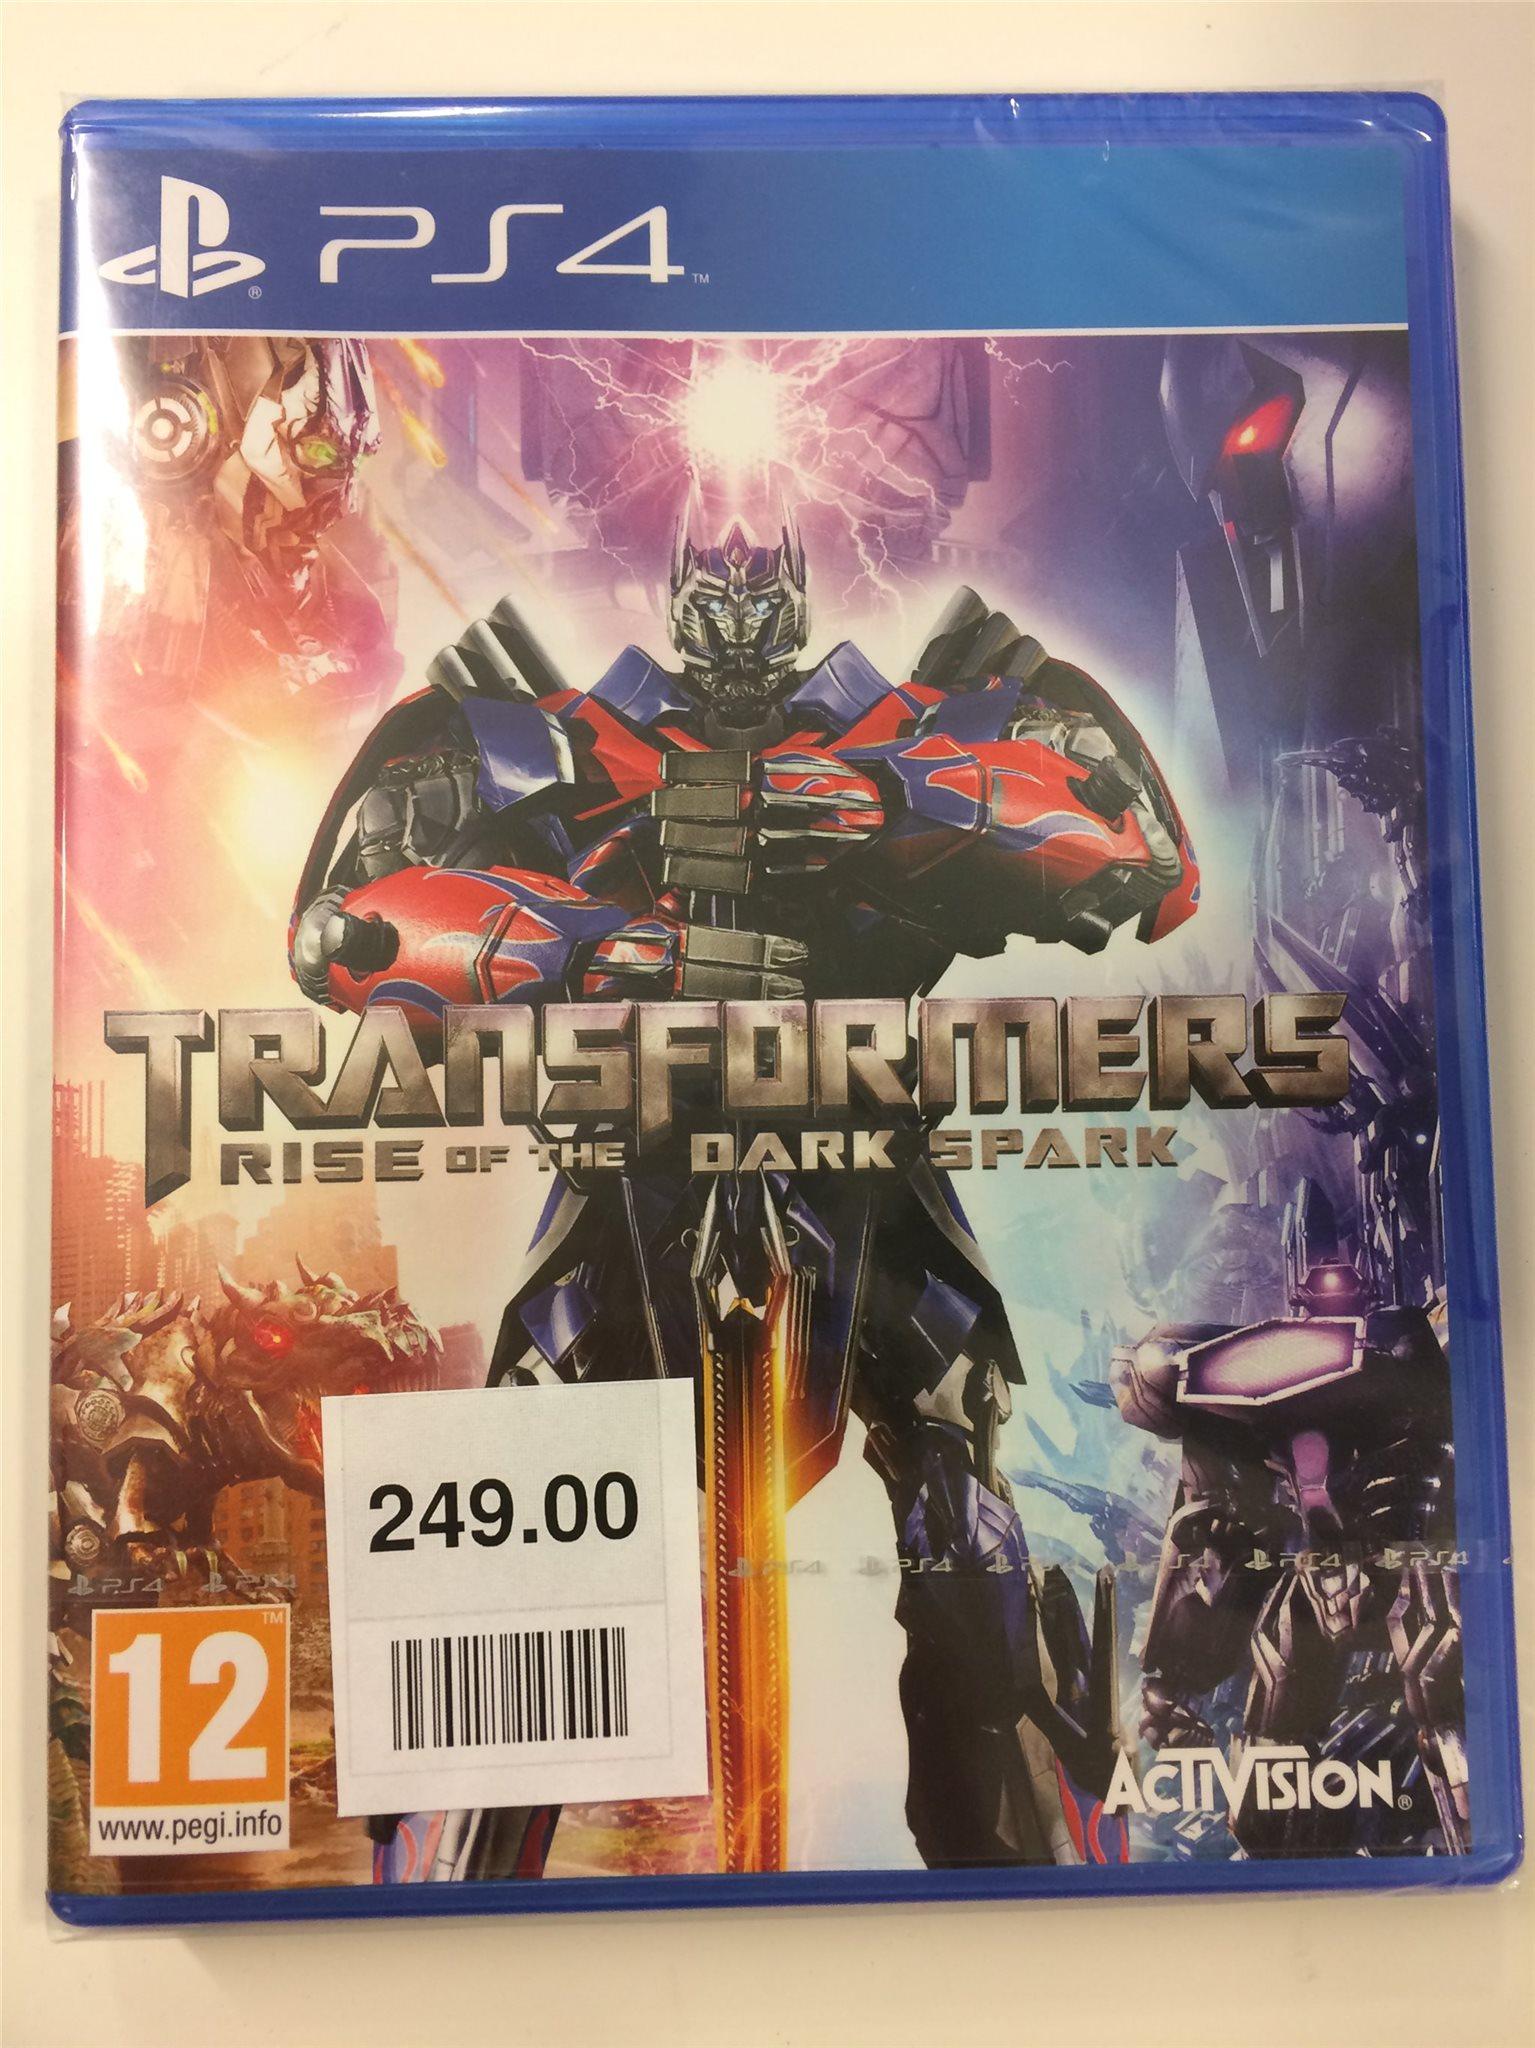 The Transformers Game | Board Game | BoardGameGeek